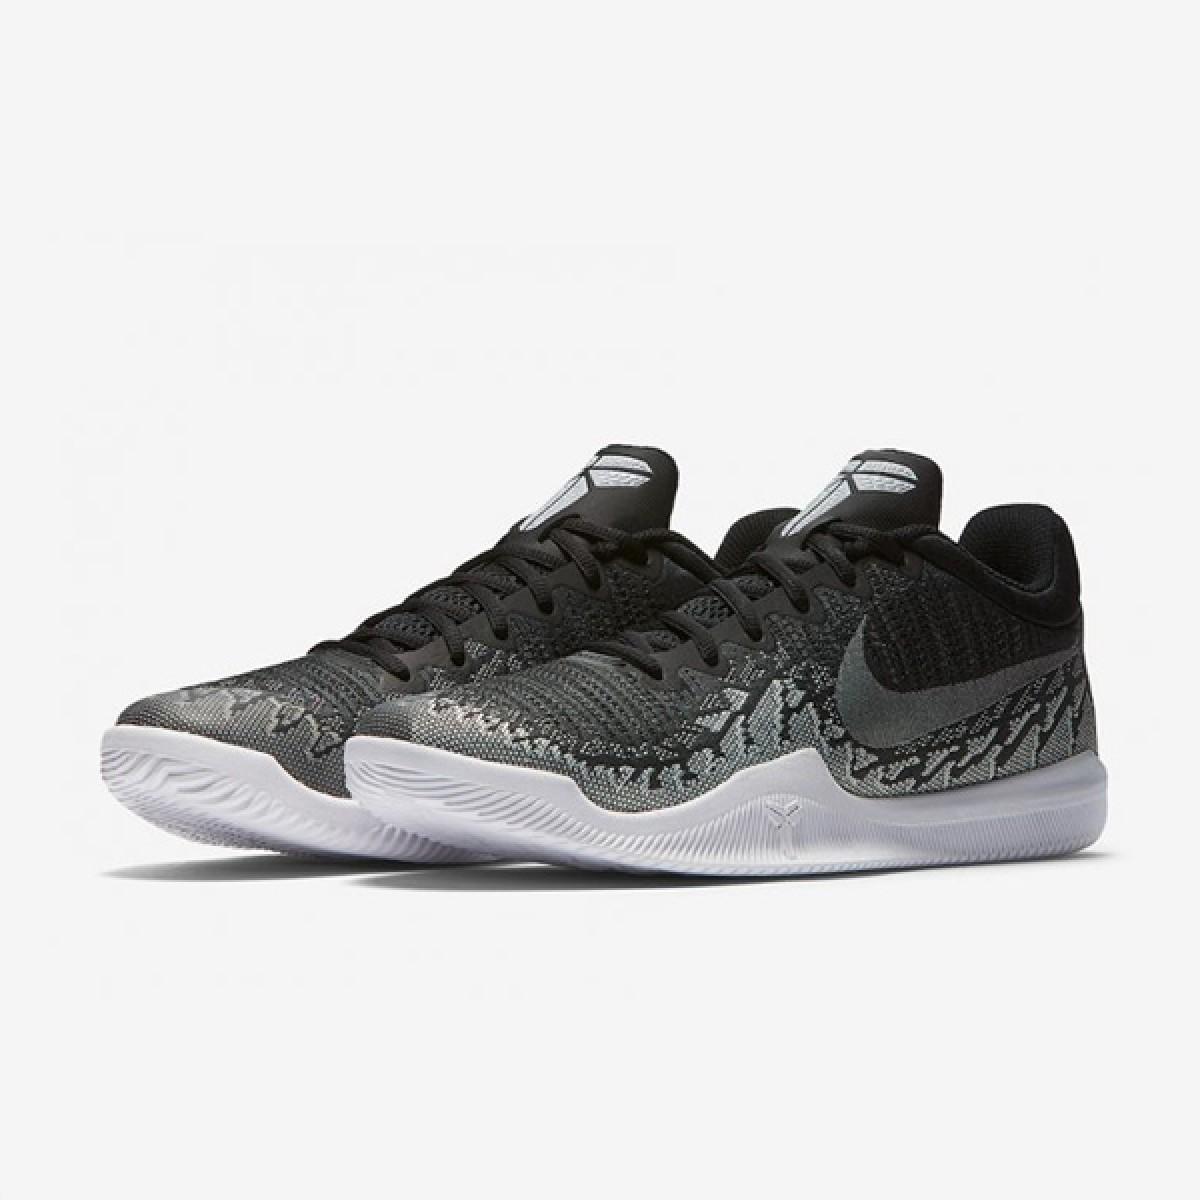 Nike Mamba Rage Jr 'Viper Grey' 908972-001-Jr